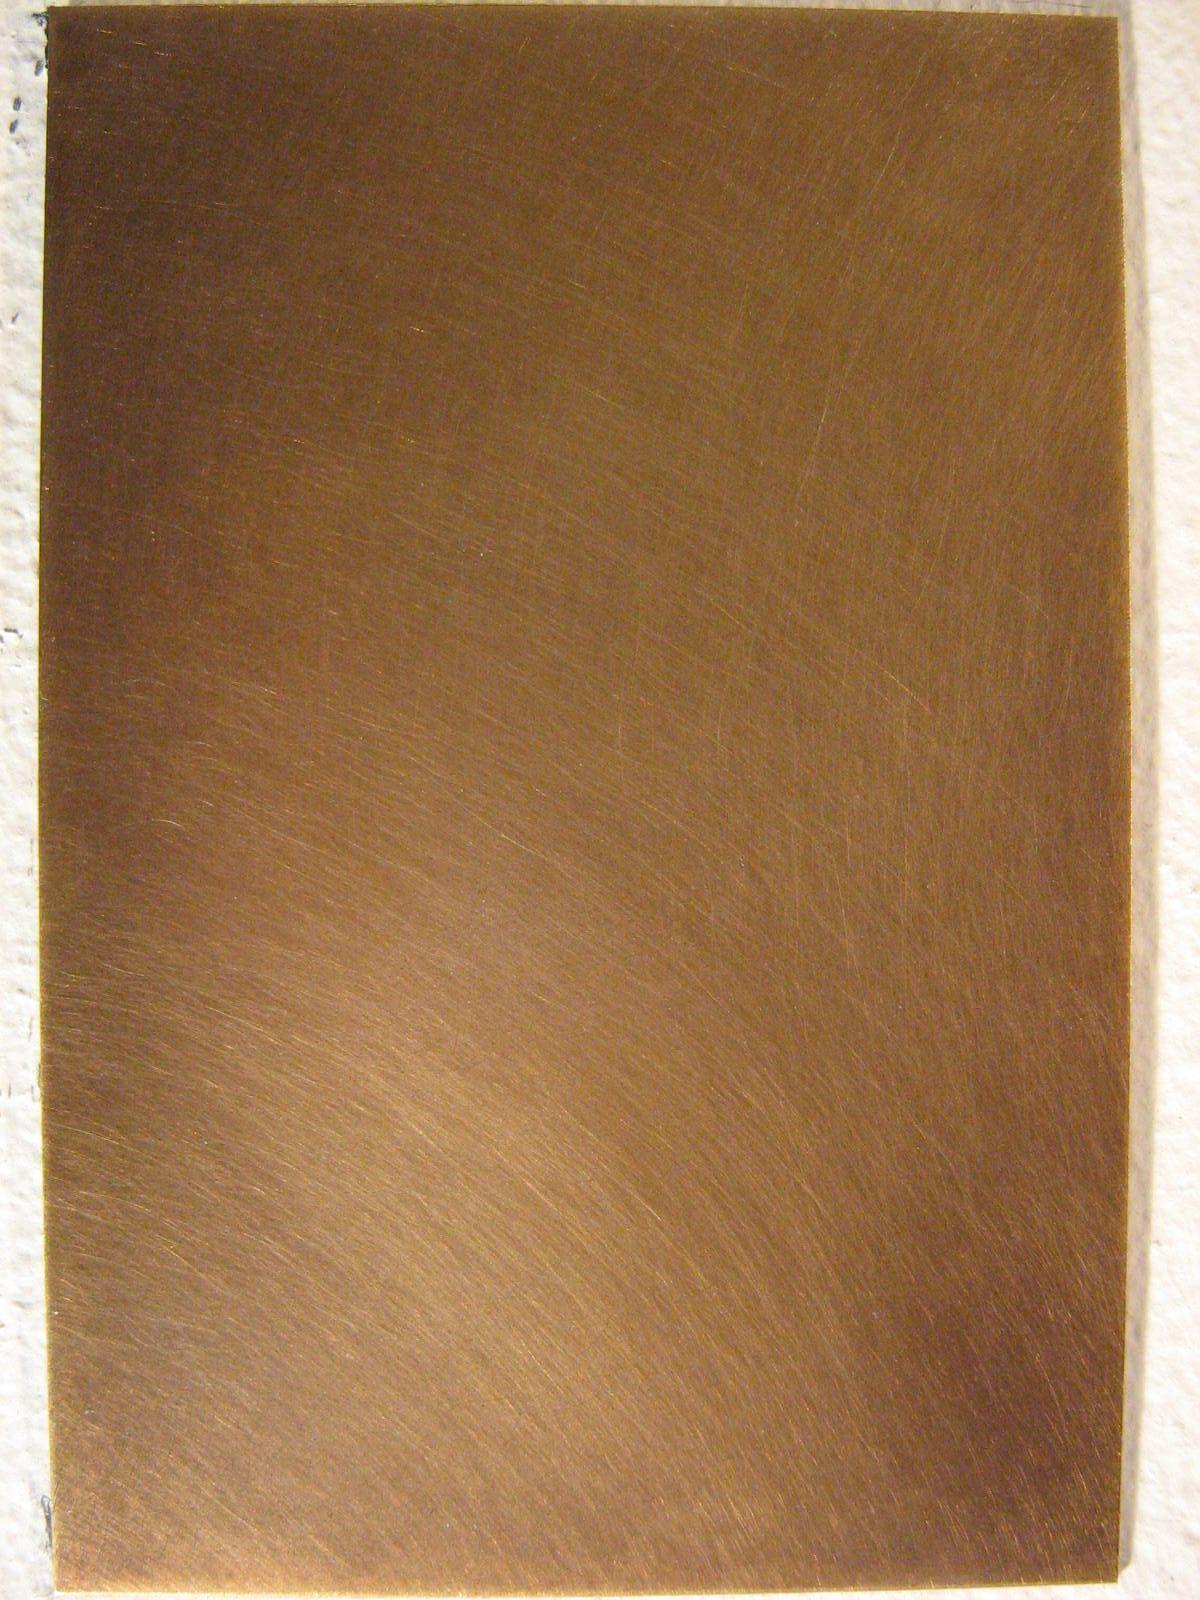 Rubbed Bronze Textures Pinterest